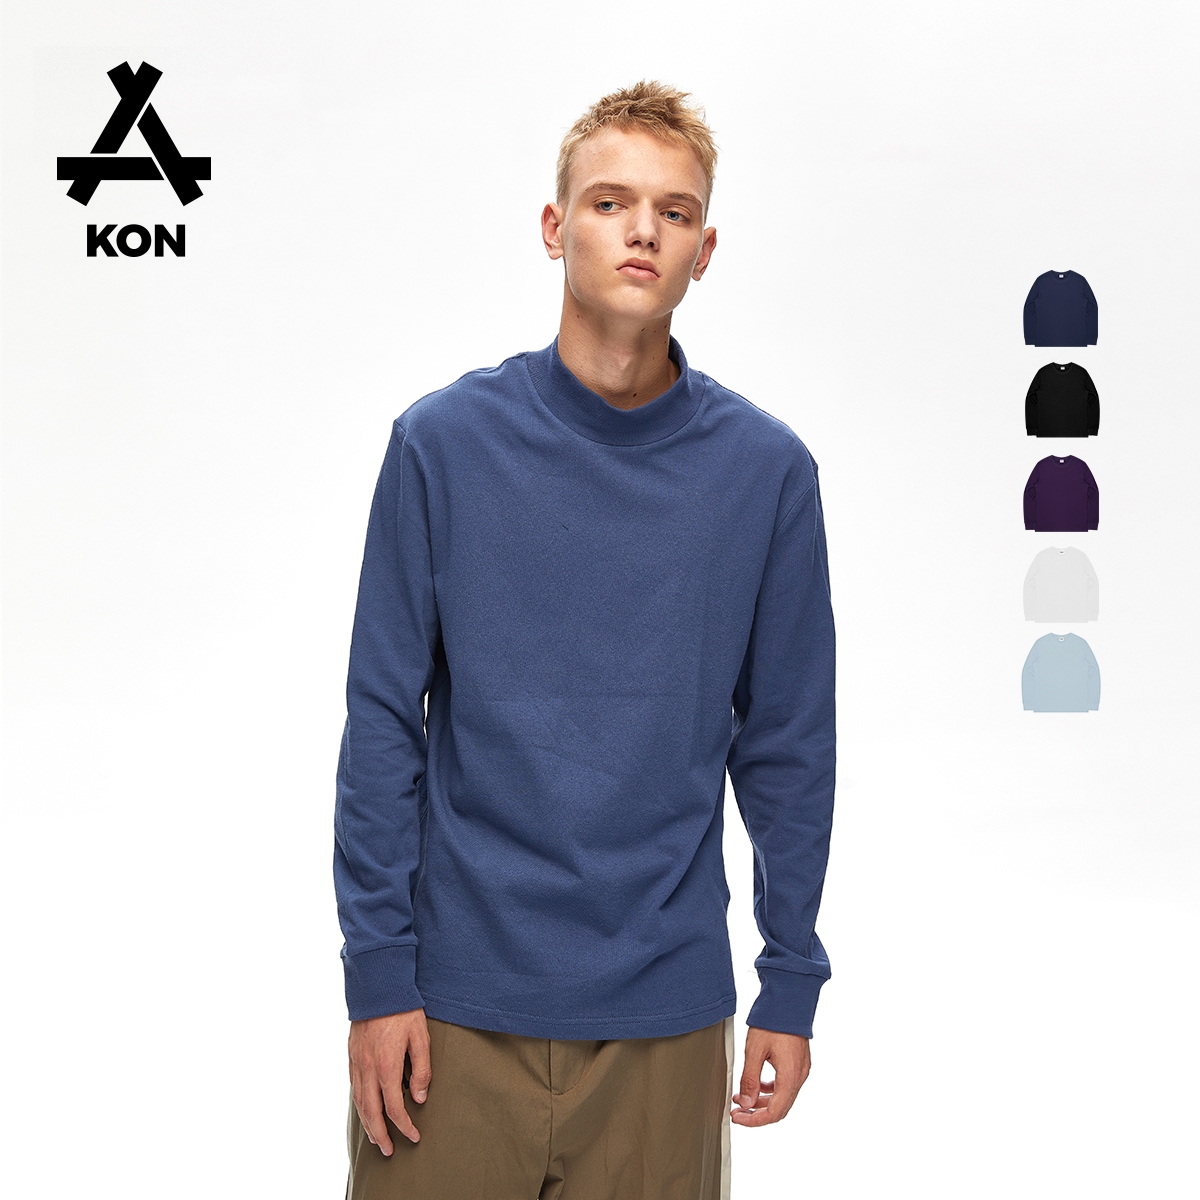 kon-prime多色纯棉长袖t恤打底衫热销90件限时2件3折